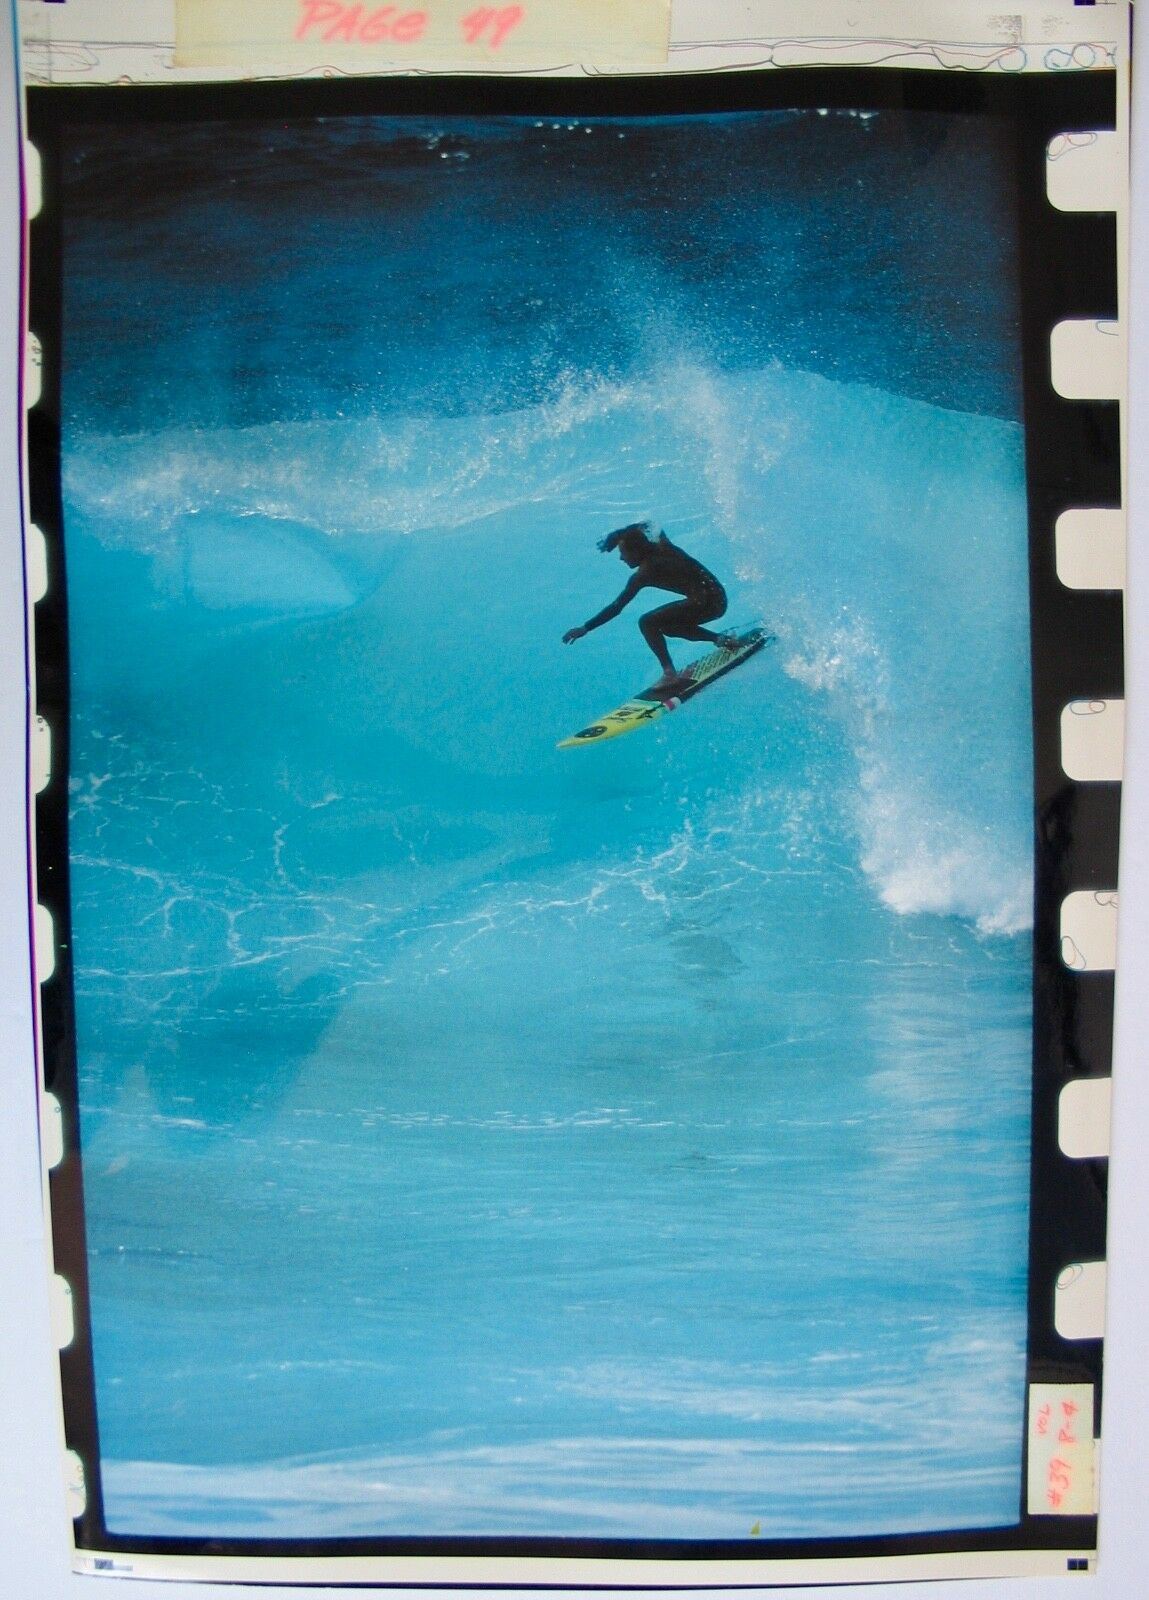 Vintage 1988 Original Photograph Breakout Surf Magazine Vol 8 No 4 Surfboard 16